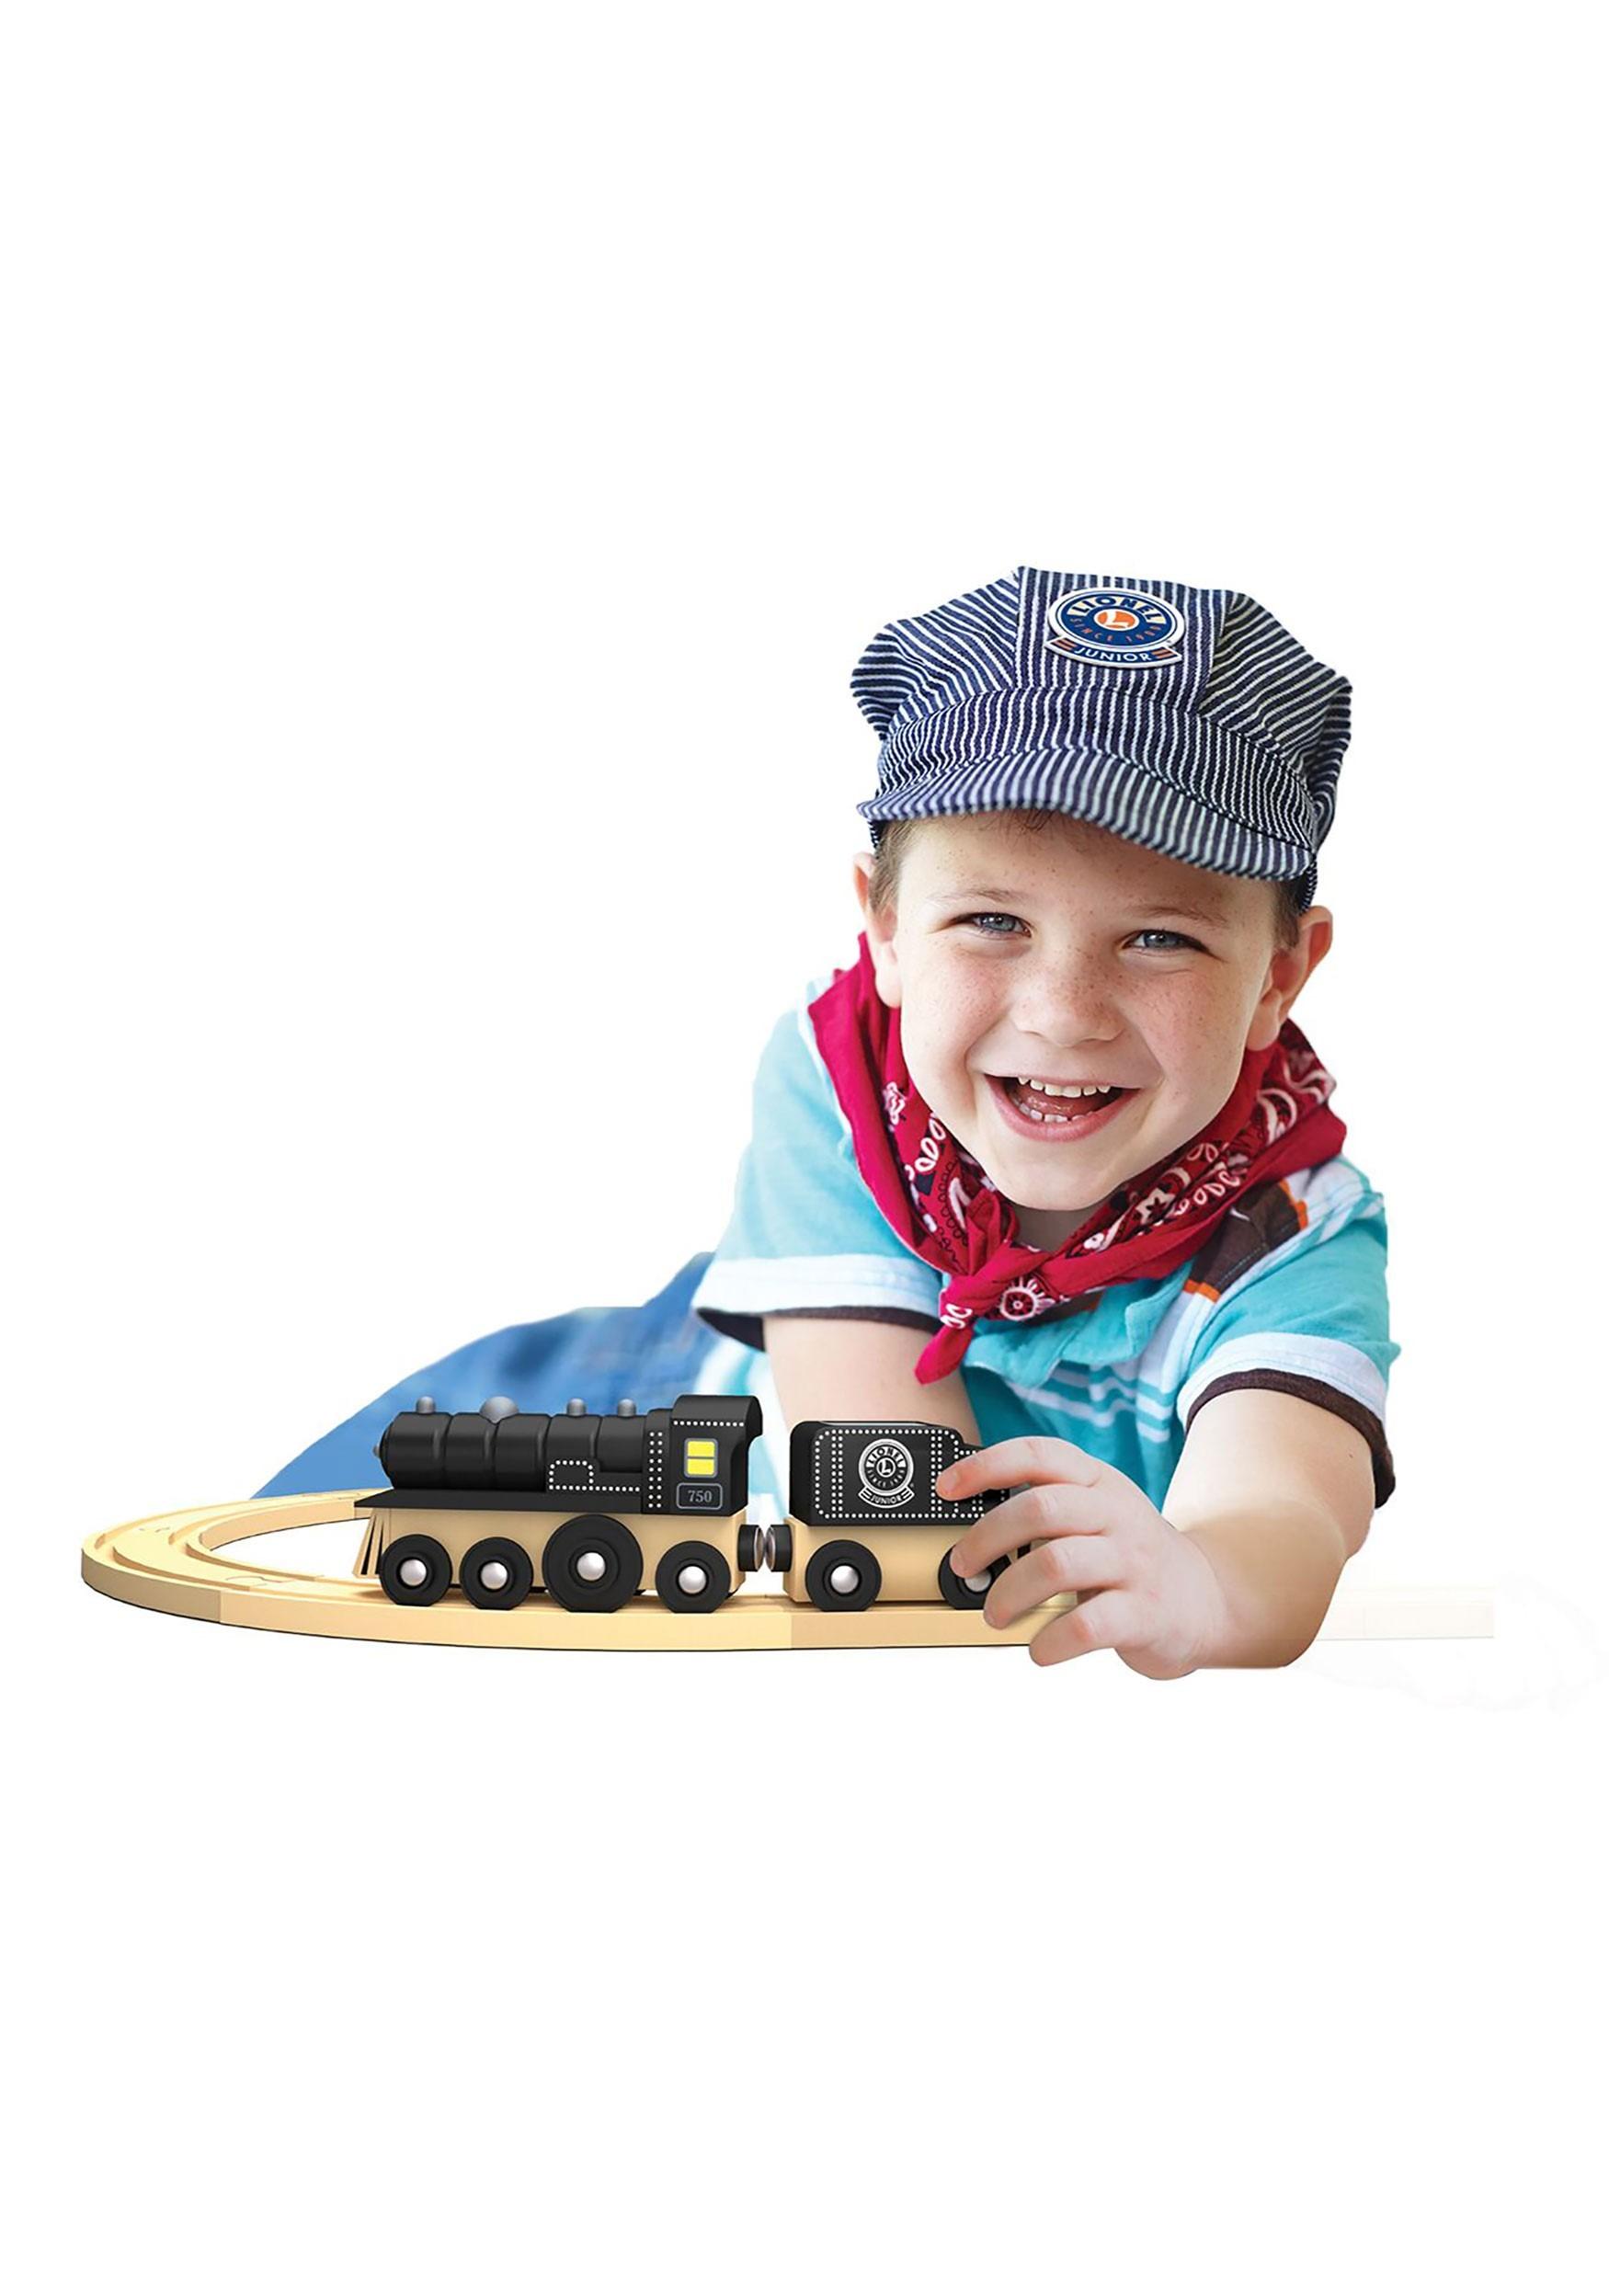 Lionel Steam & Coal Car Train Set for Kids